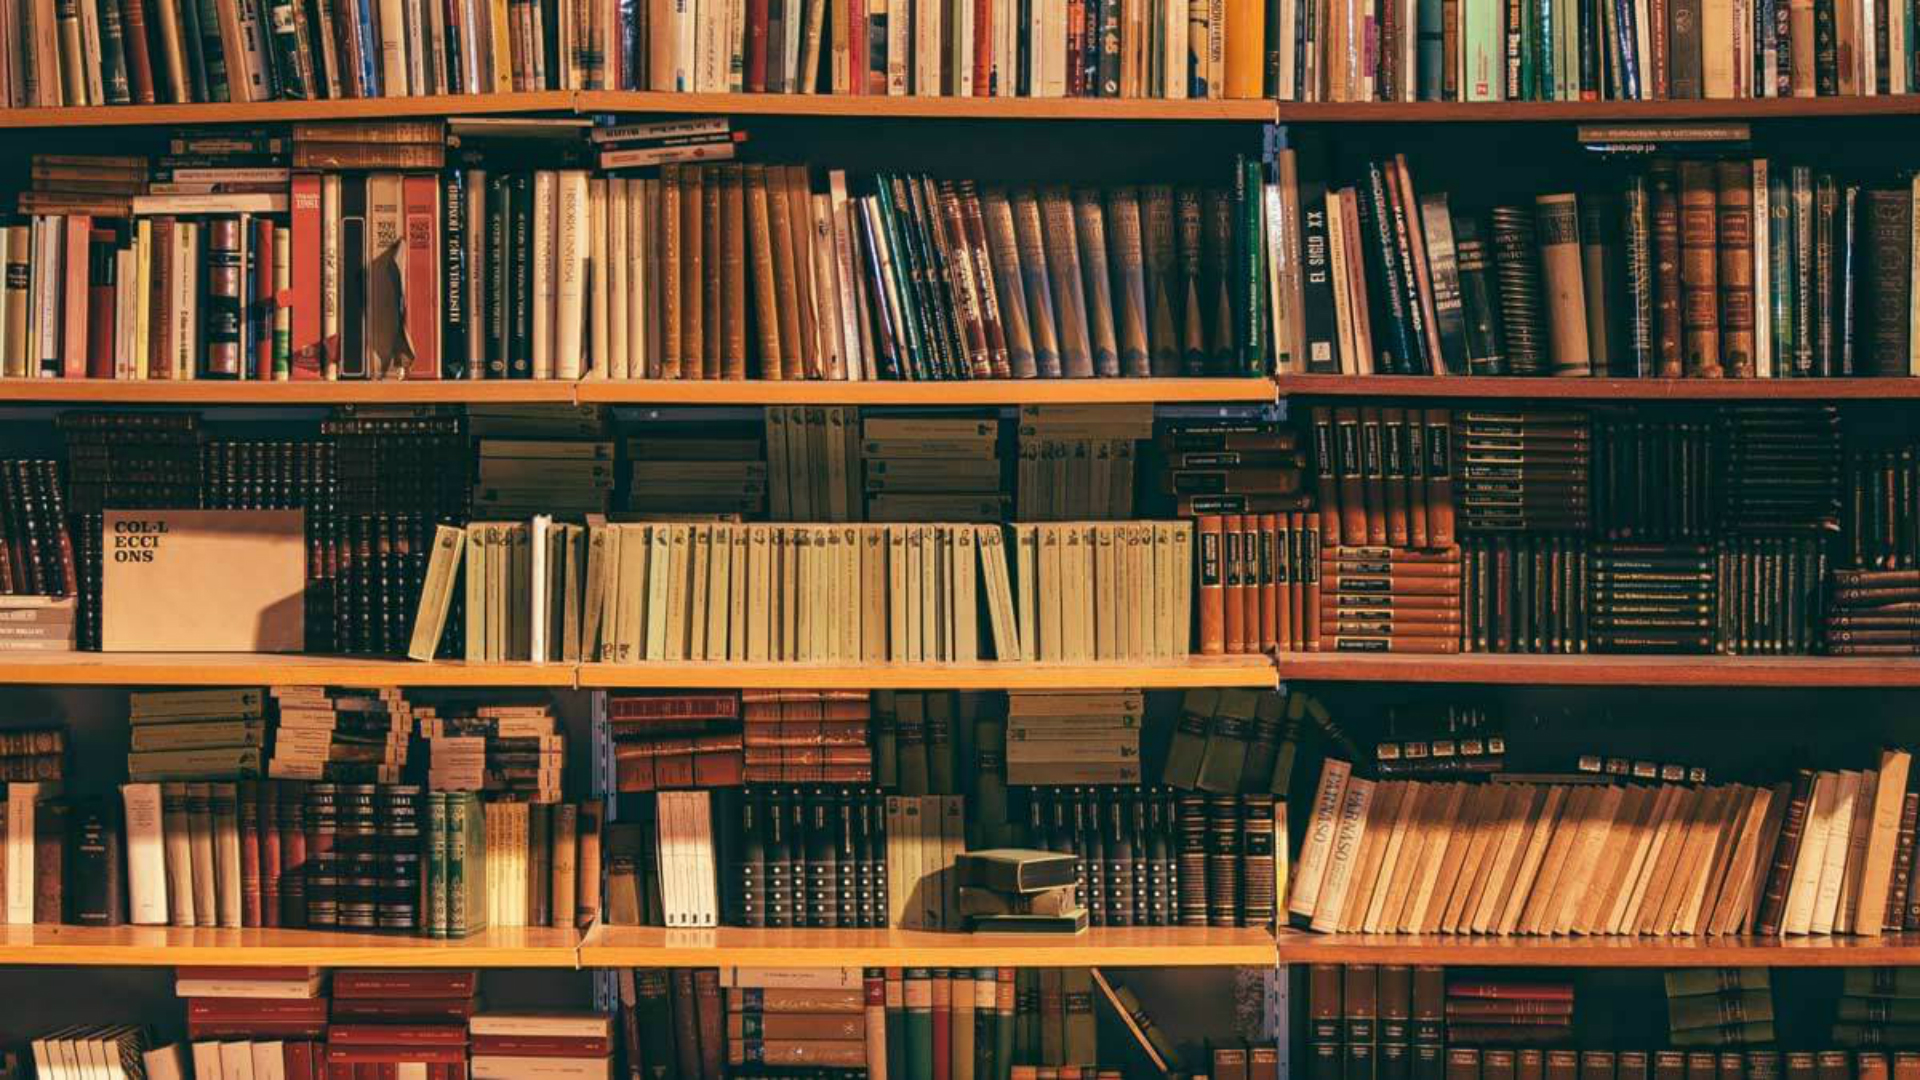 10 lugares turísticos de interés literario